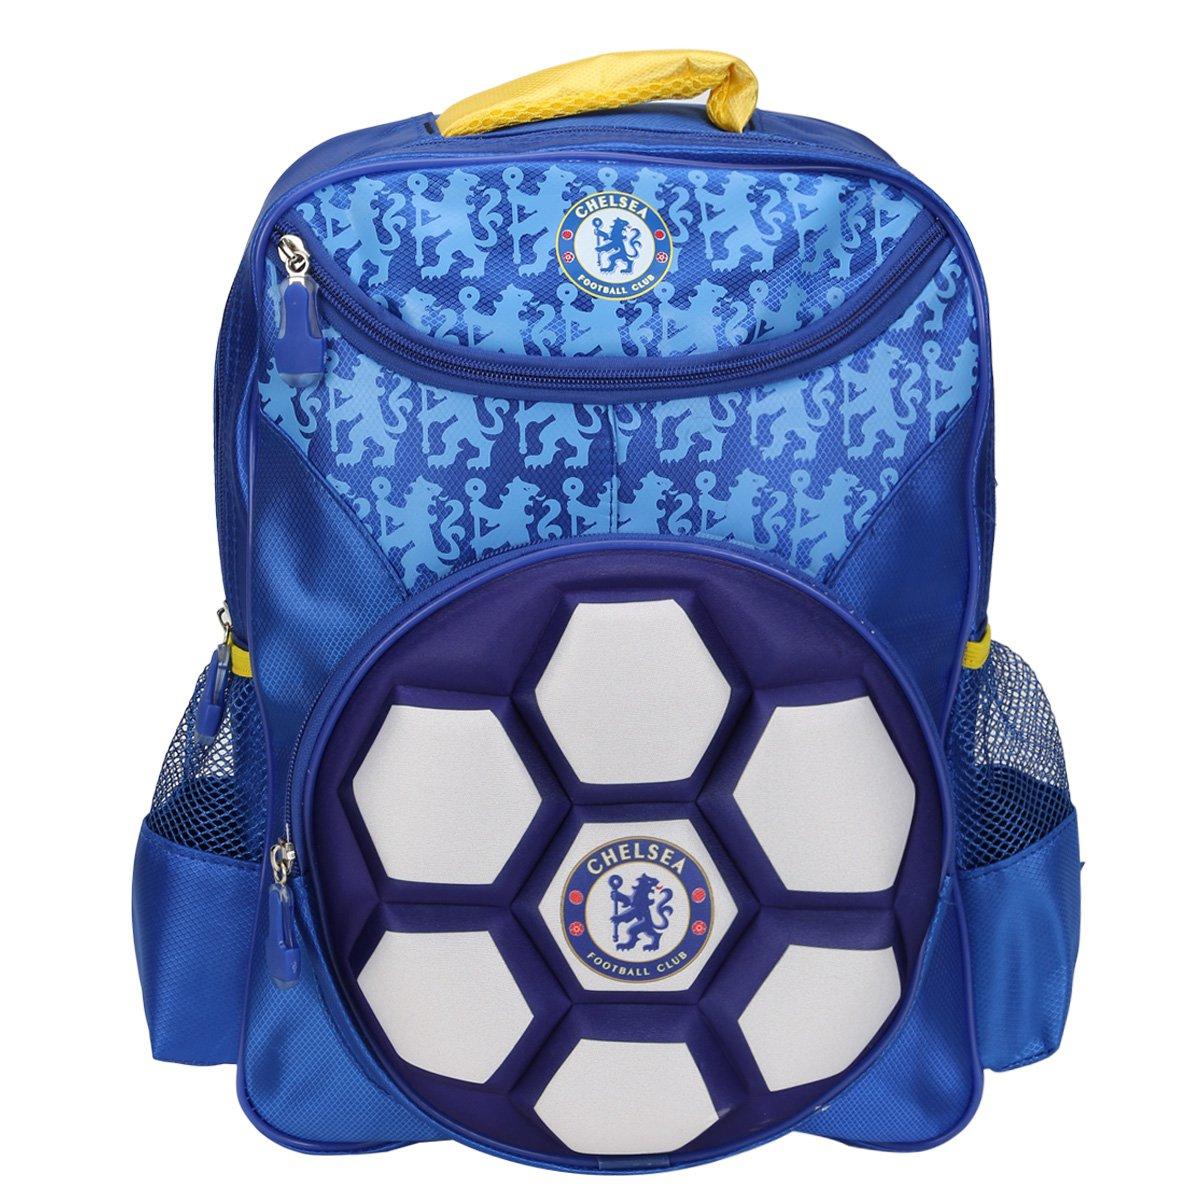 Mochila Chelsea Intantil Bola 3D - Compre Agora  538439abaae21